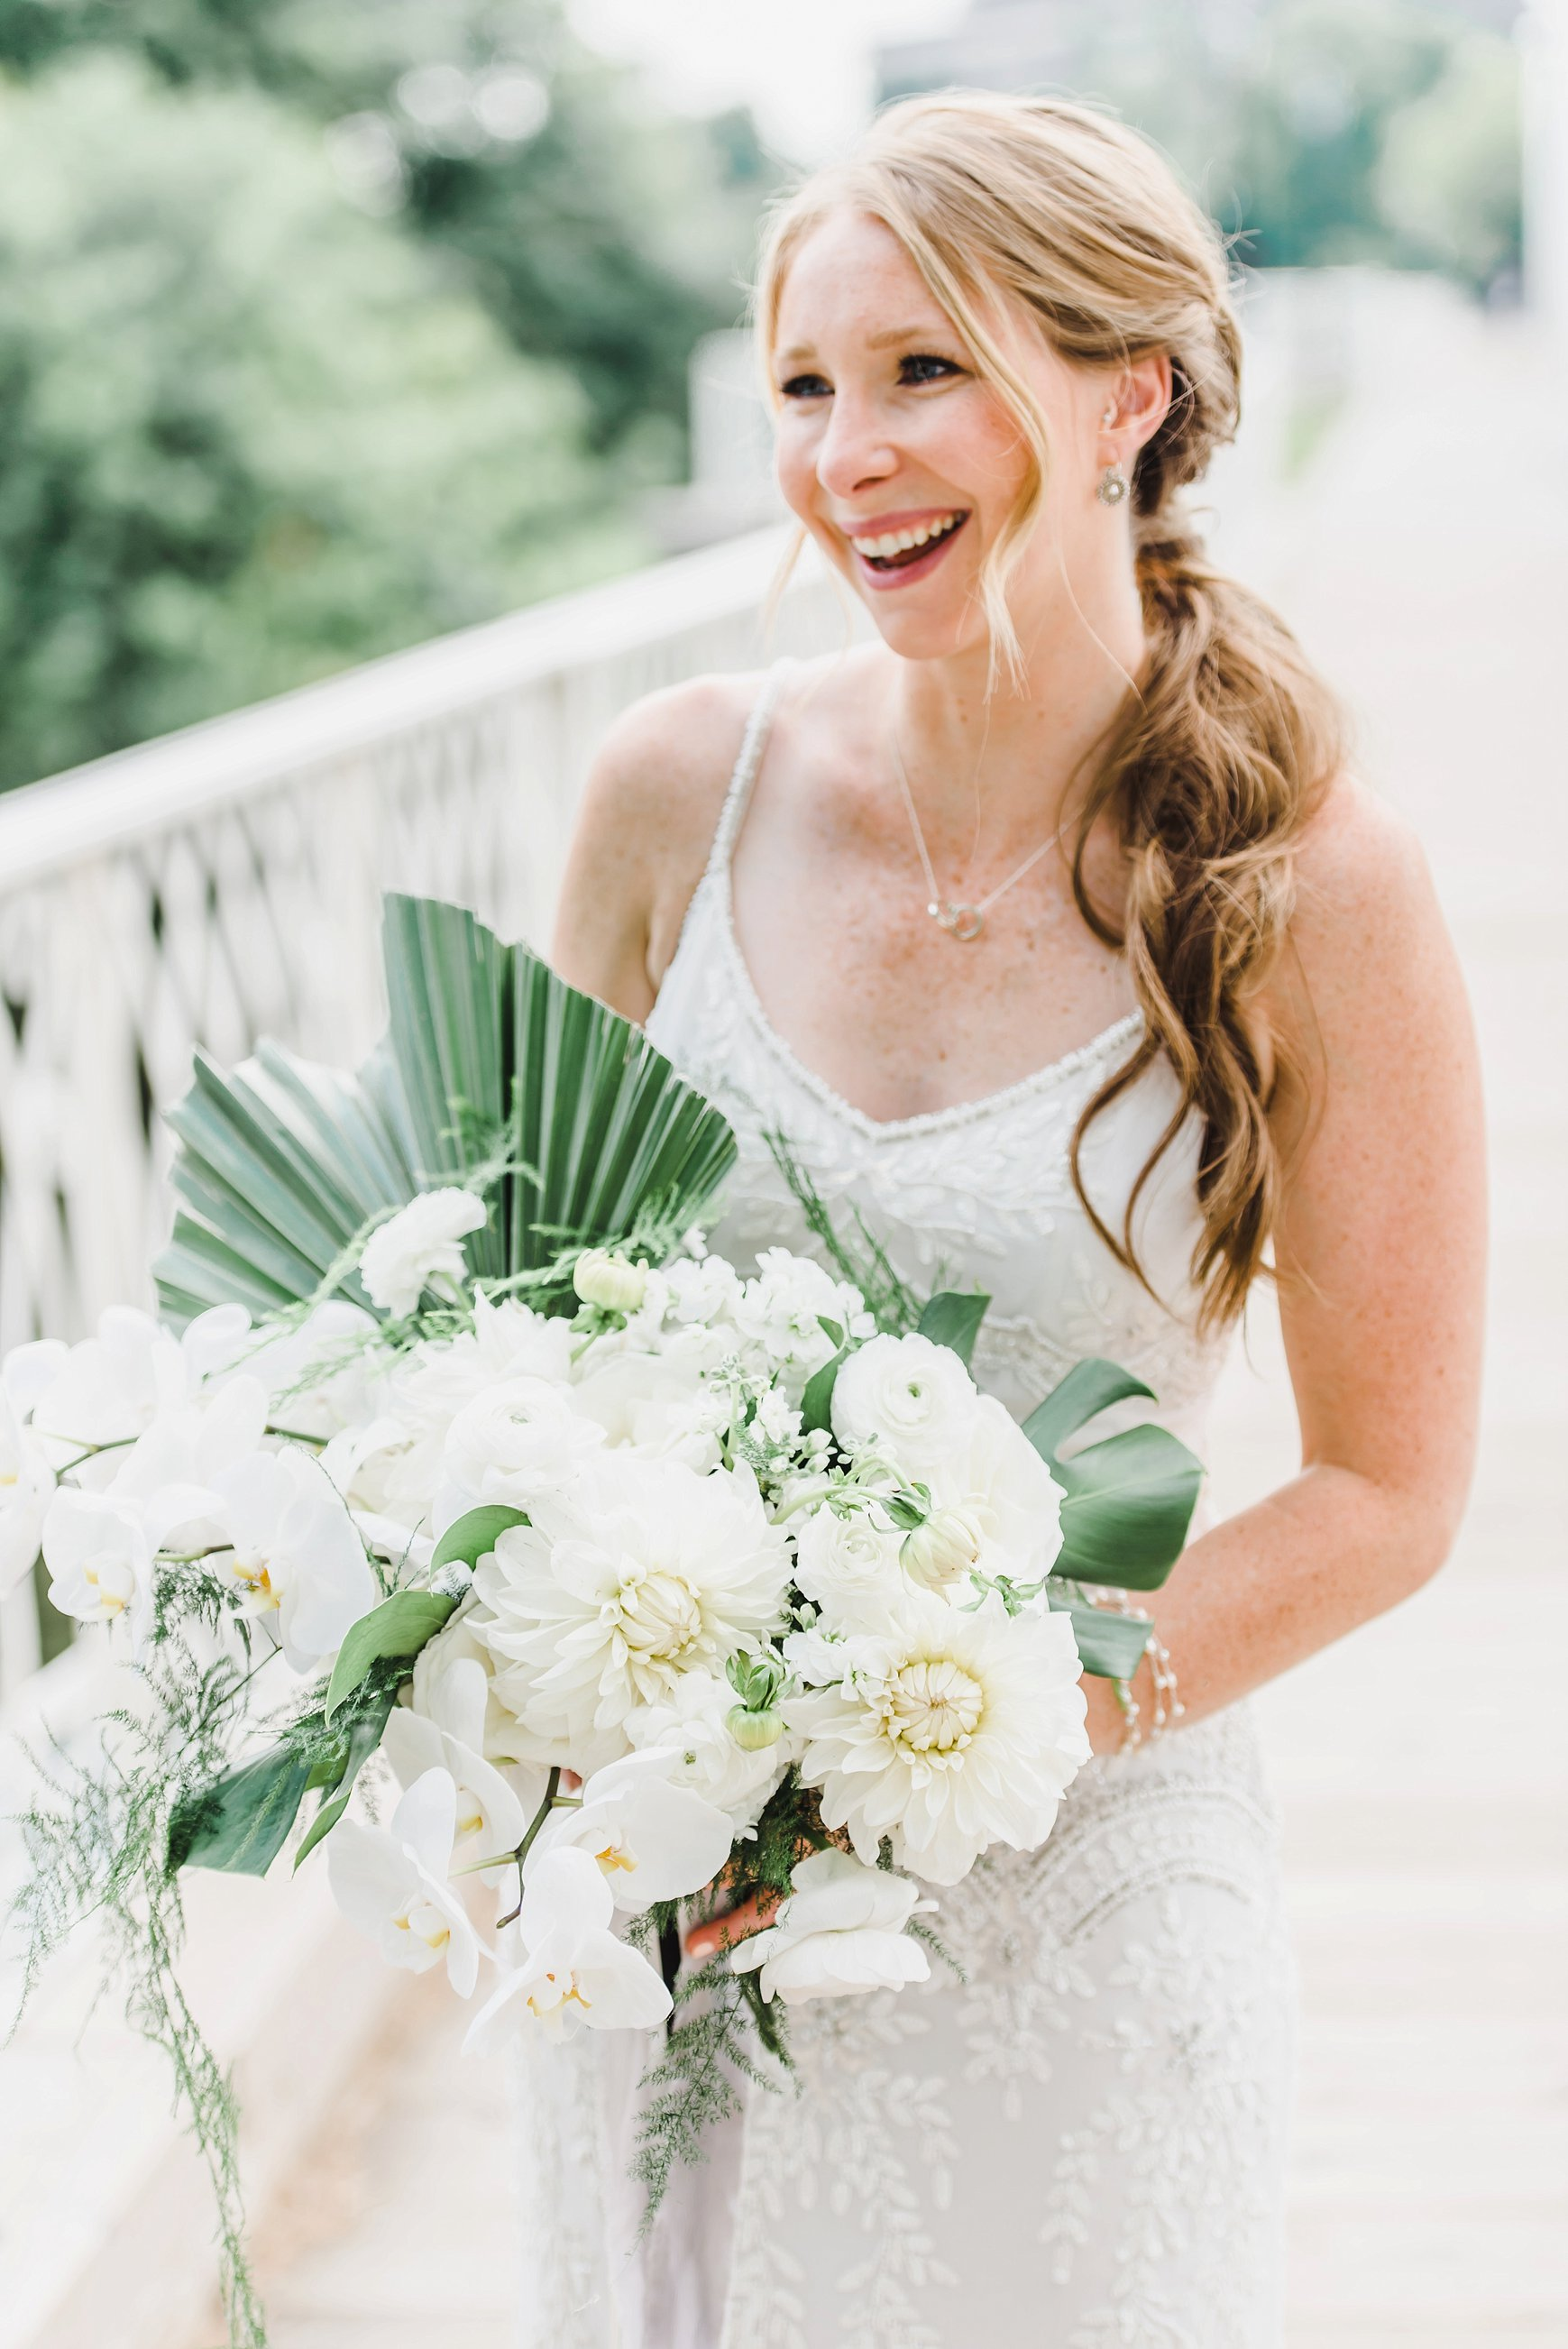 light airy indie fine art ottawa wedding photographer | Ali and Batoul Photography_0652.jpg